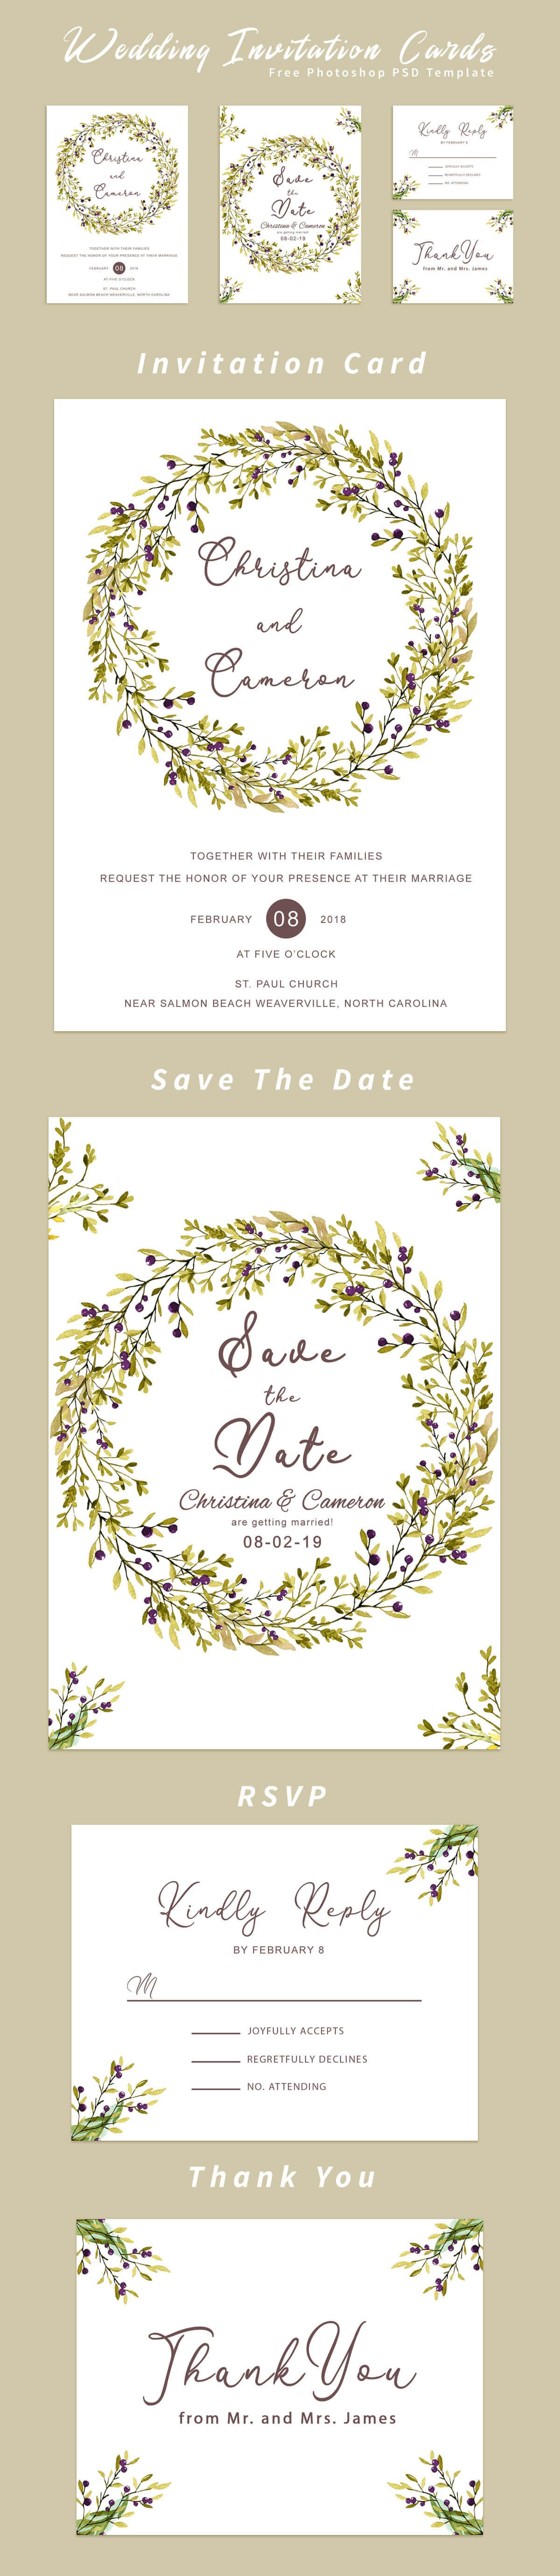 Free Wedding Invitation Card Template ~ Creativetacos